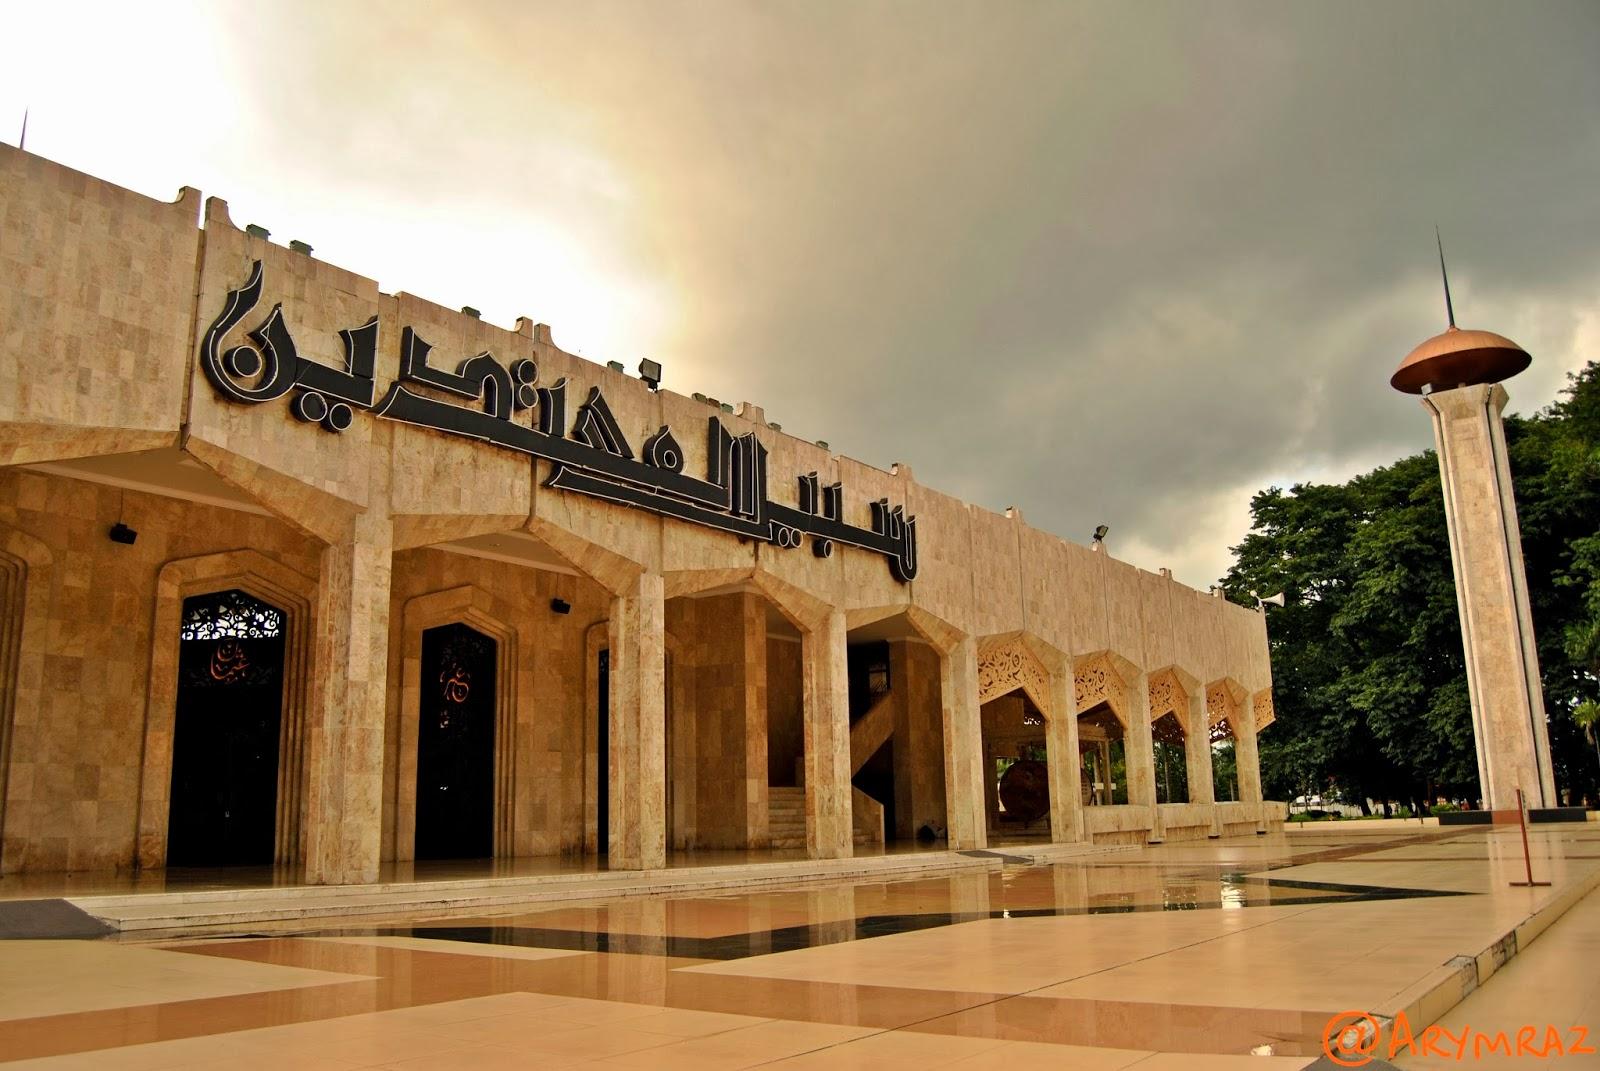 Ary Wardhana Yusuf Jejakku Mesjid Raya Sabilal Muhtadin 01 Masjid